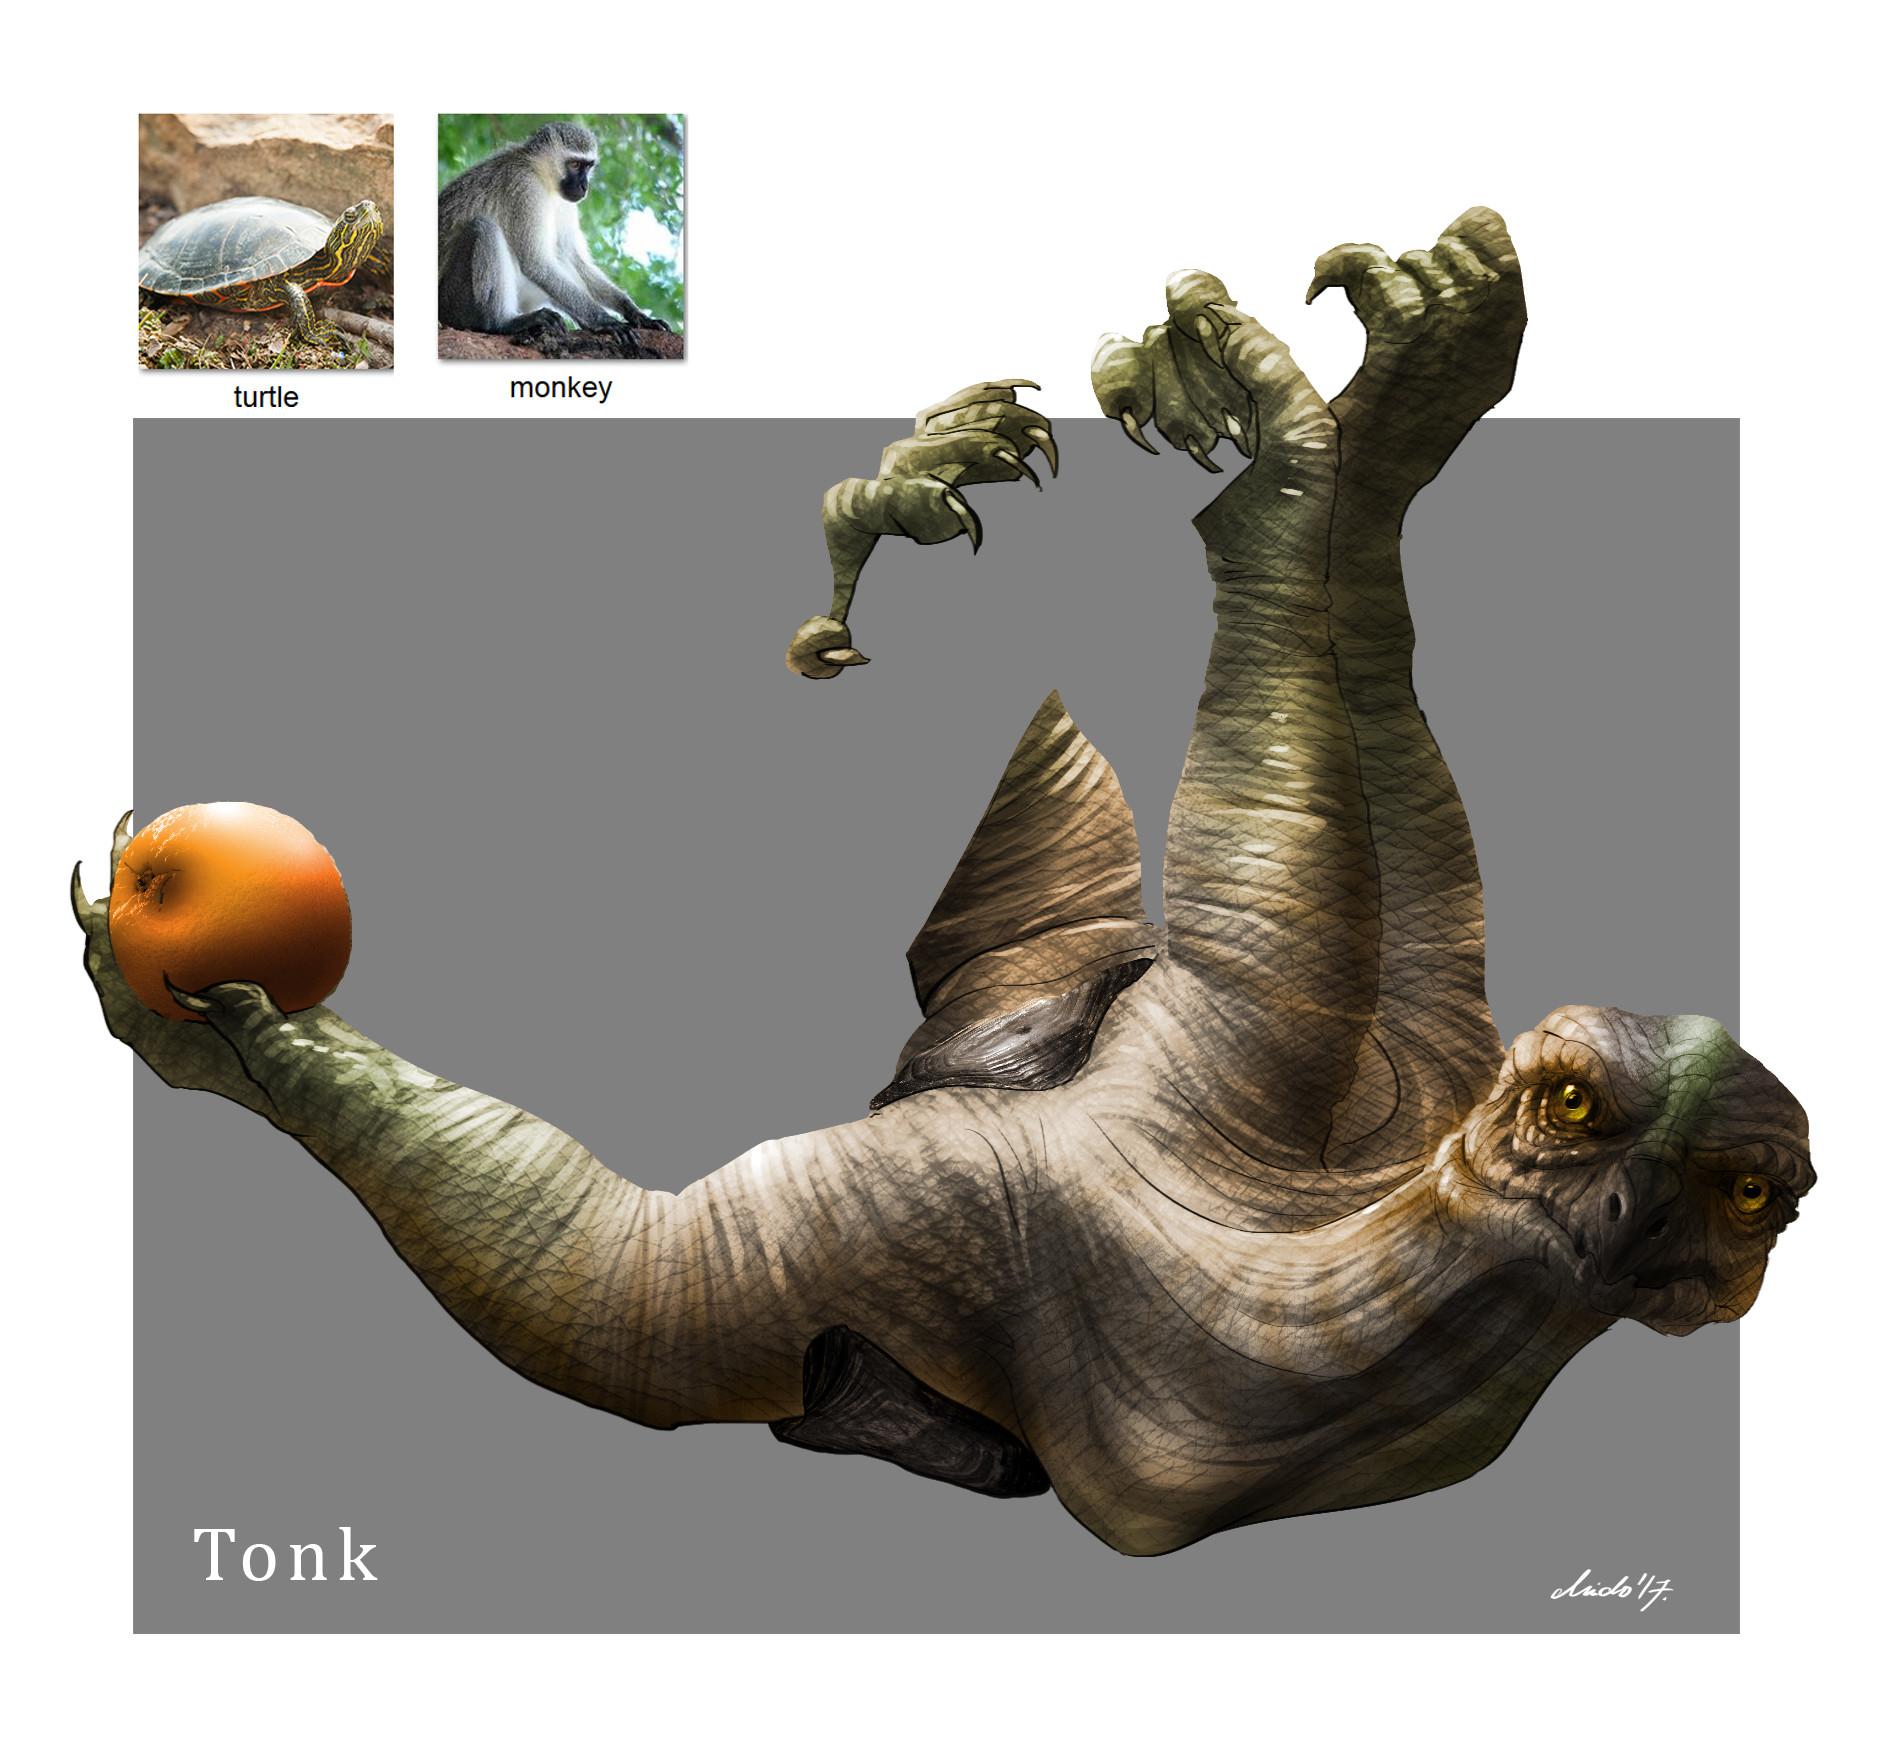 Midhat kapetanovic random creature mashup 032 tonk